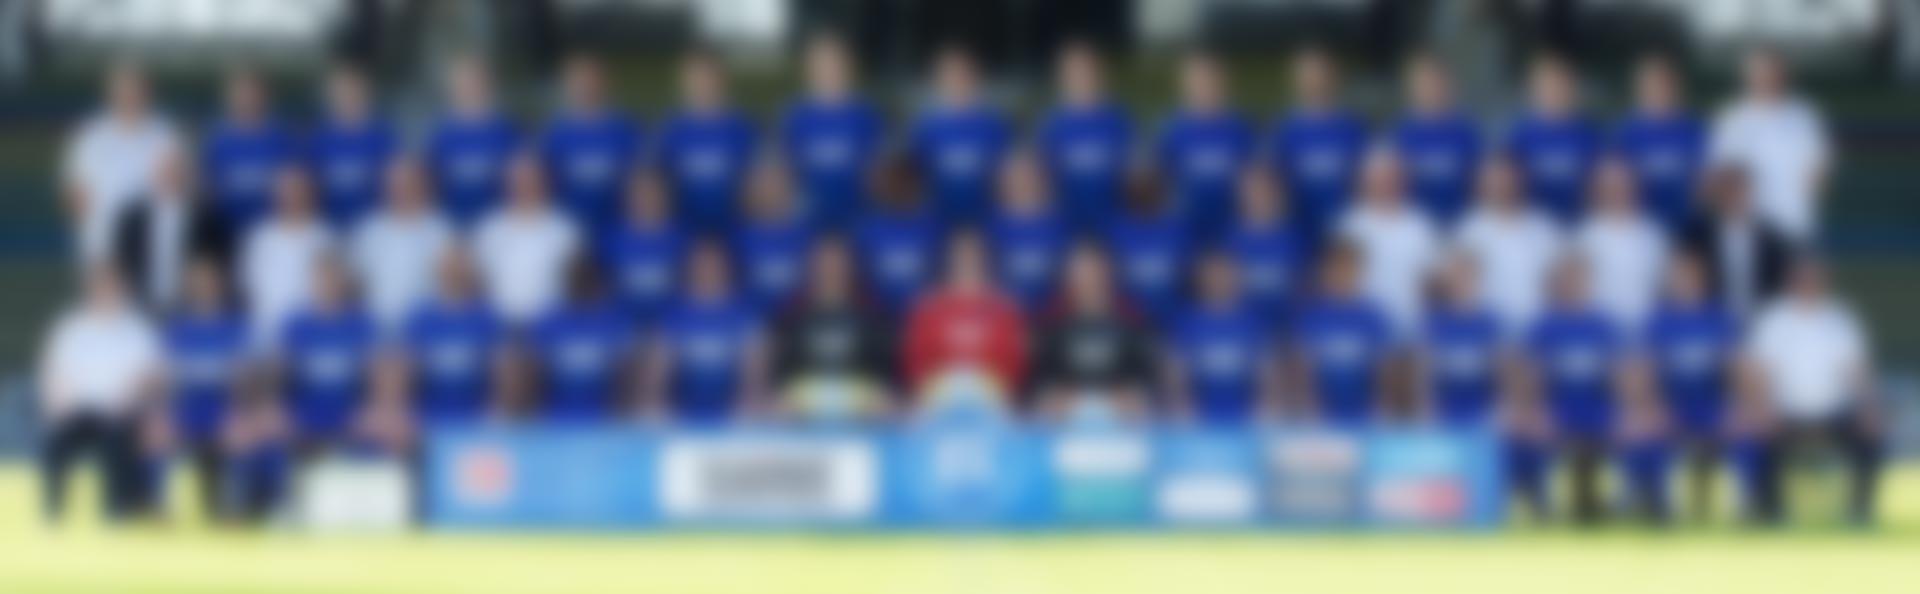 Spieler: Karlsruher SC